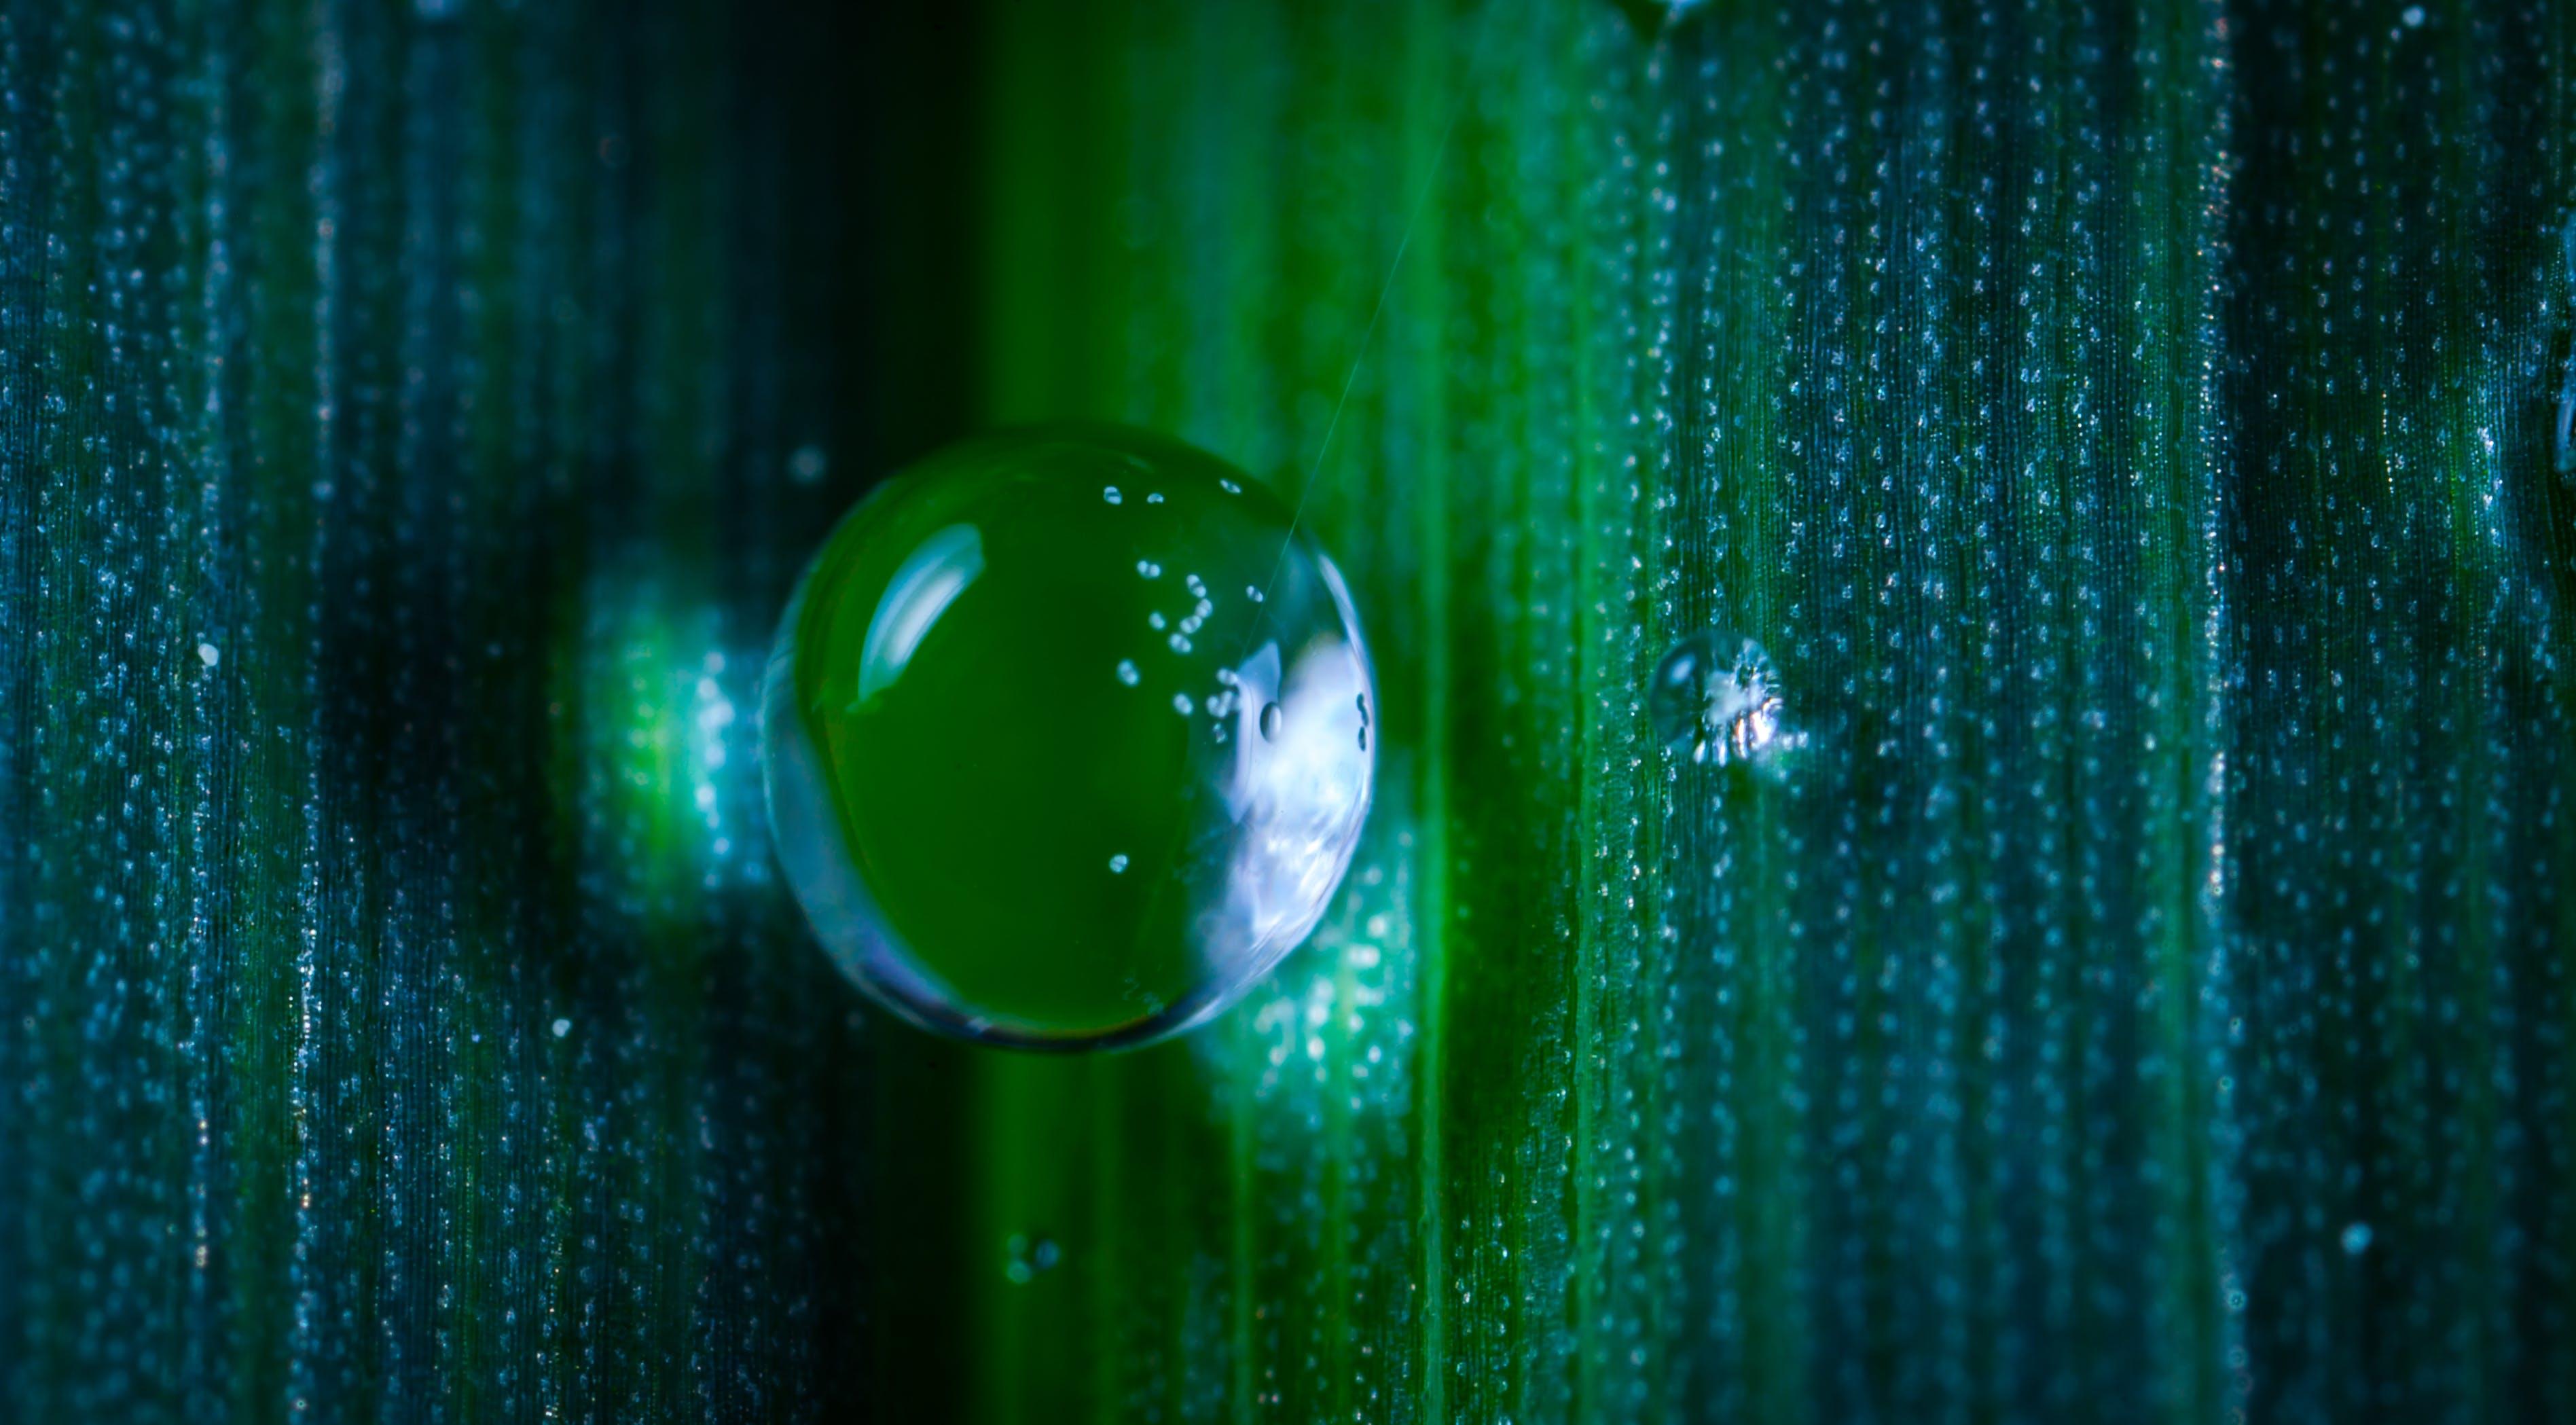 Closeup Photography of Dew